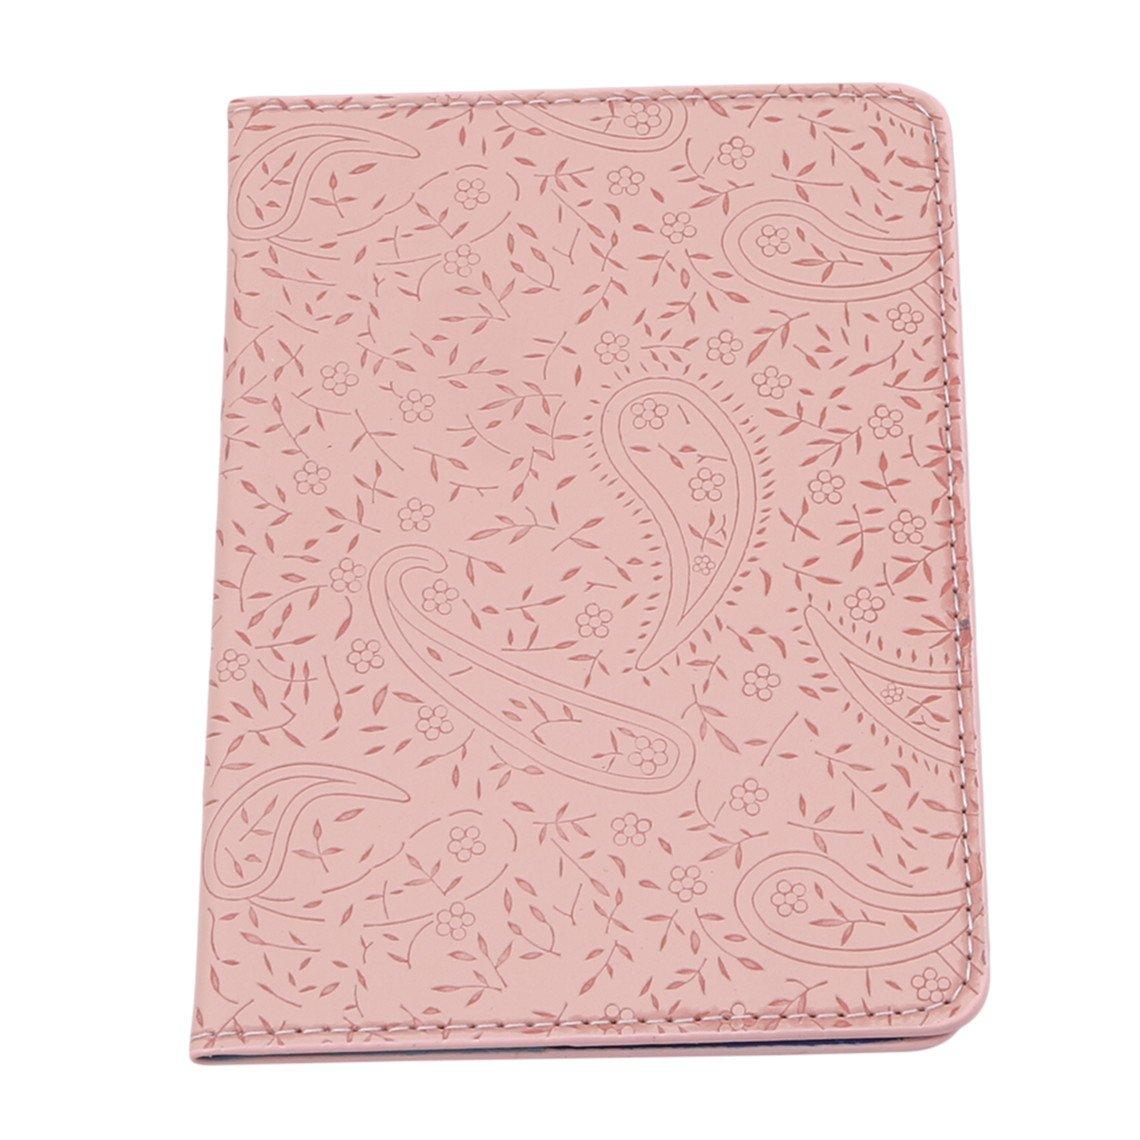 Rurah Cute Passport Holder Case Lavender Leather Passport Cover Holder Case Travel Card Wallet,Pink